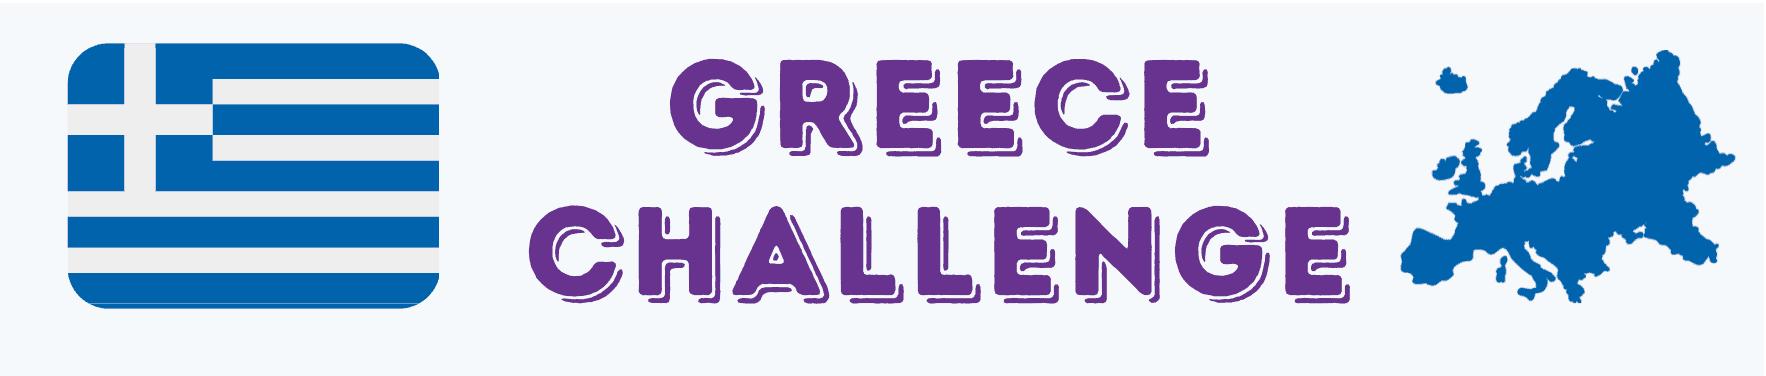 challenge-greece